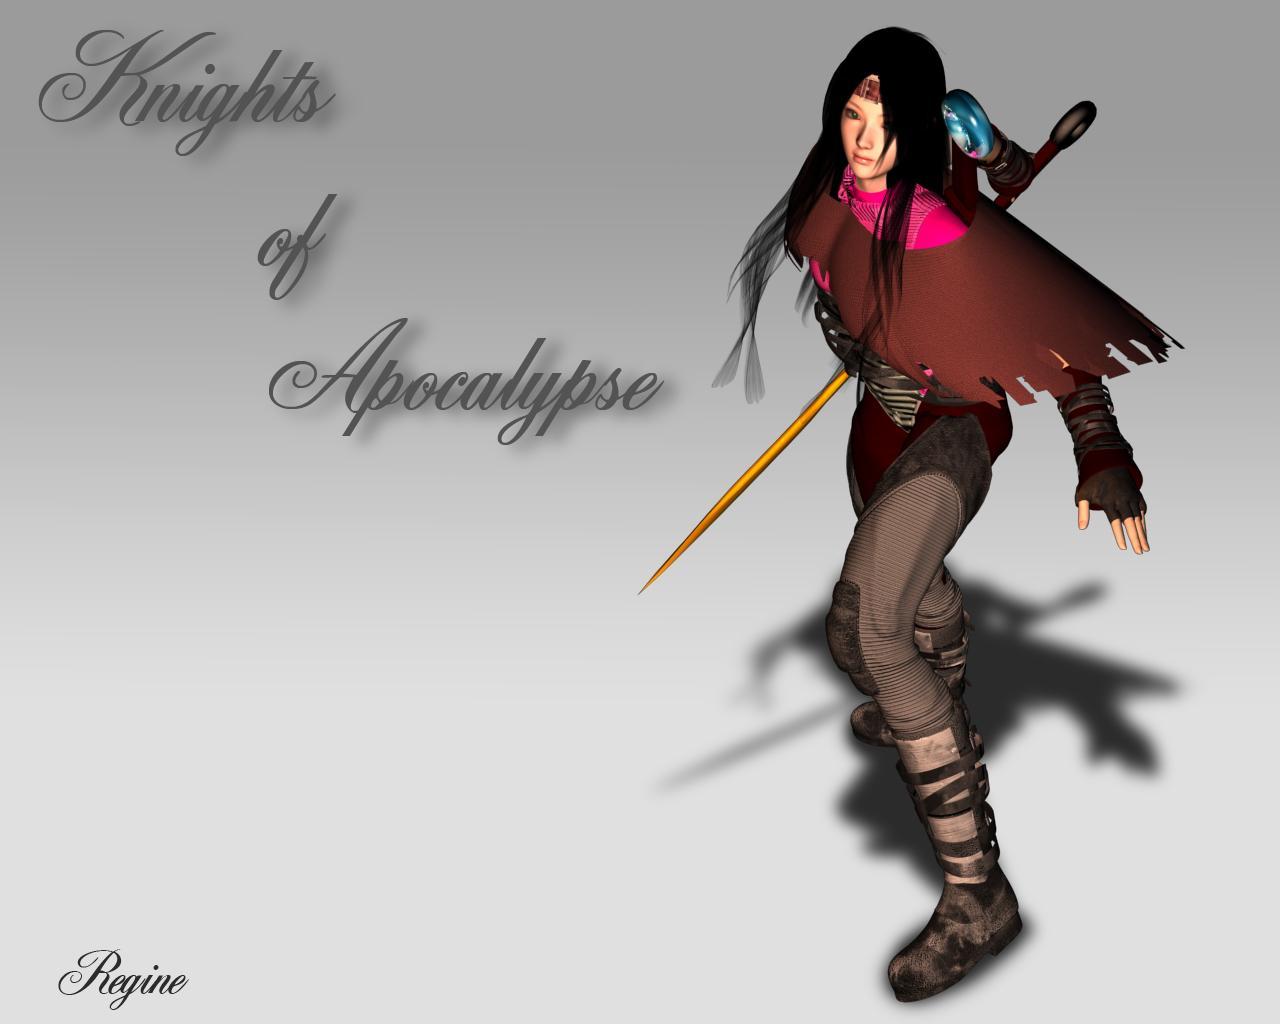 Regine - Knights of Apocalypse by JPL-Animation